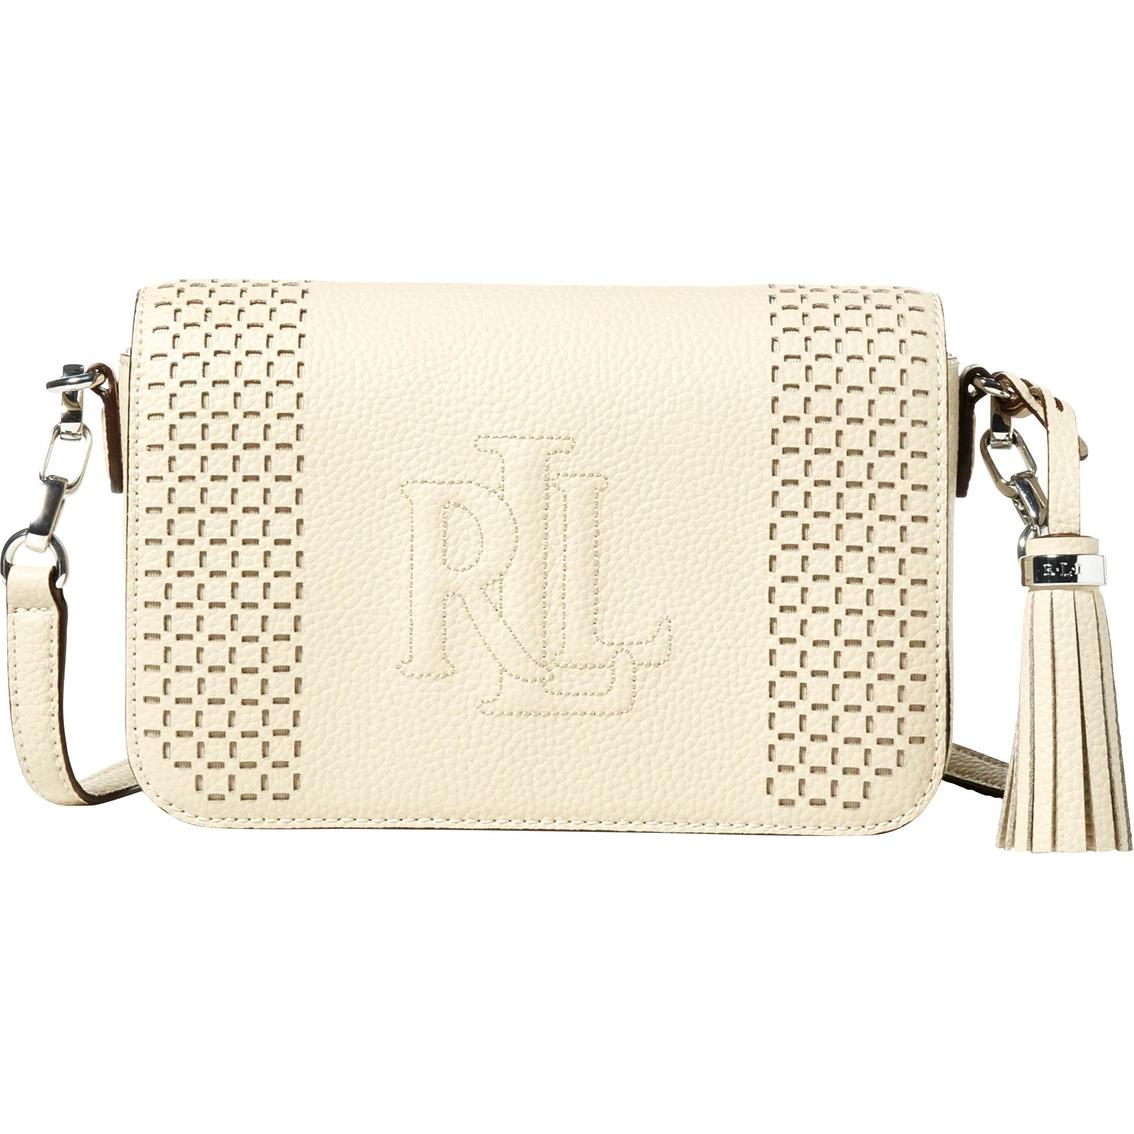 4594117746b4 Lauren Ralph Lauren Anstey Carmen Perforated Leather Crossbody ...